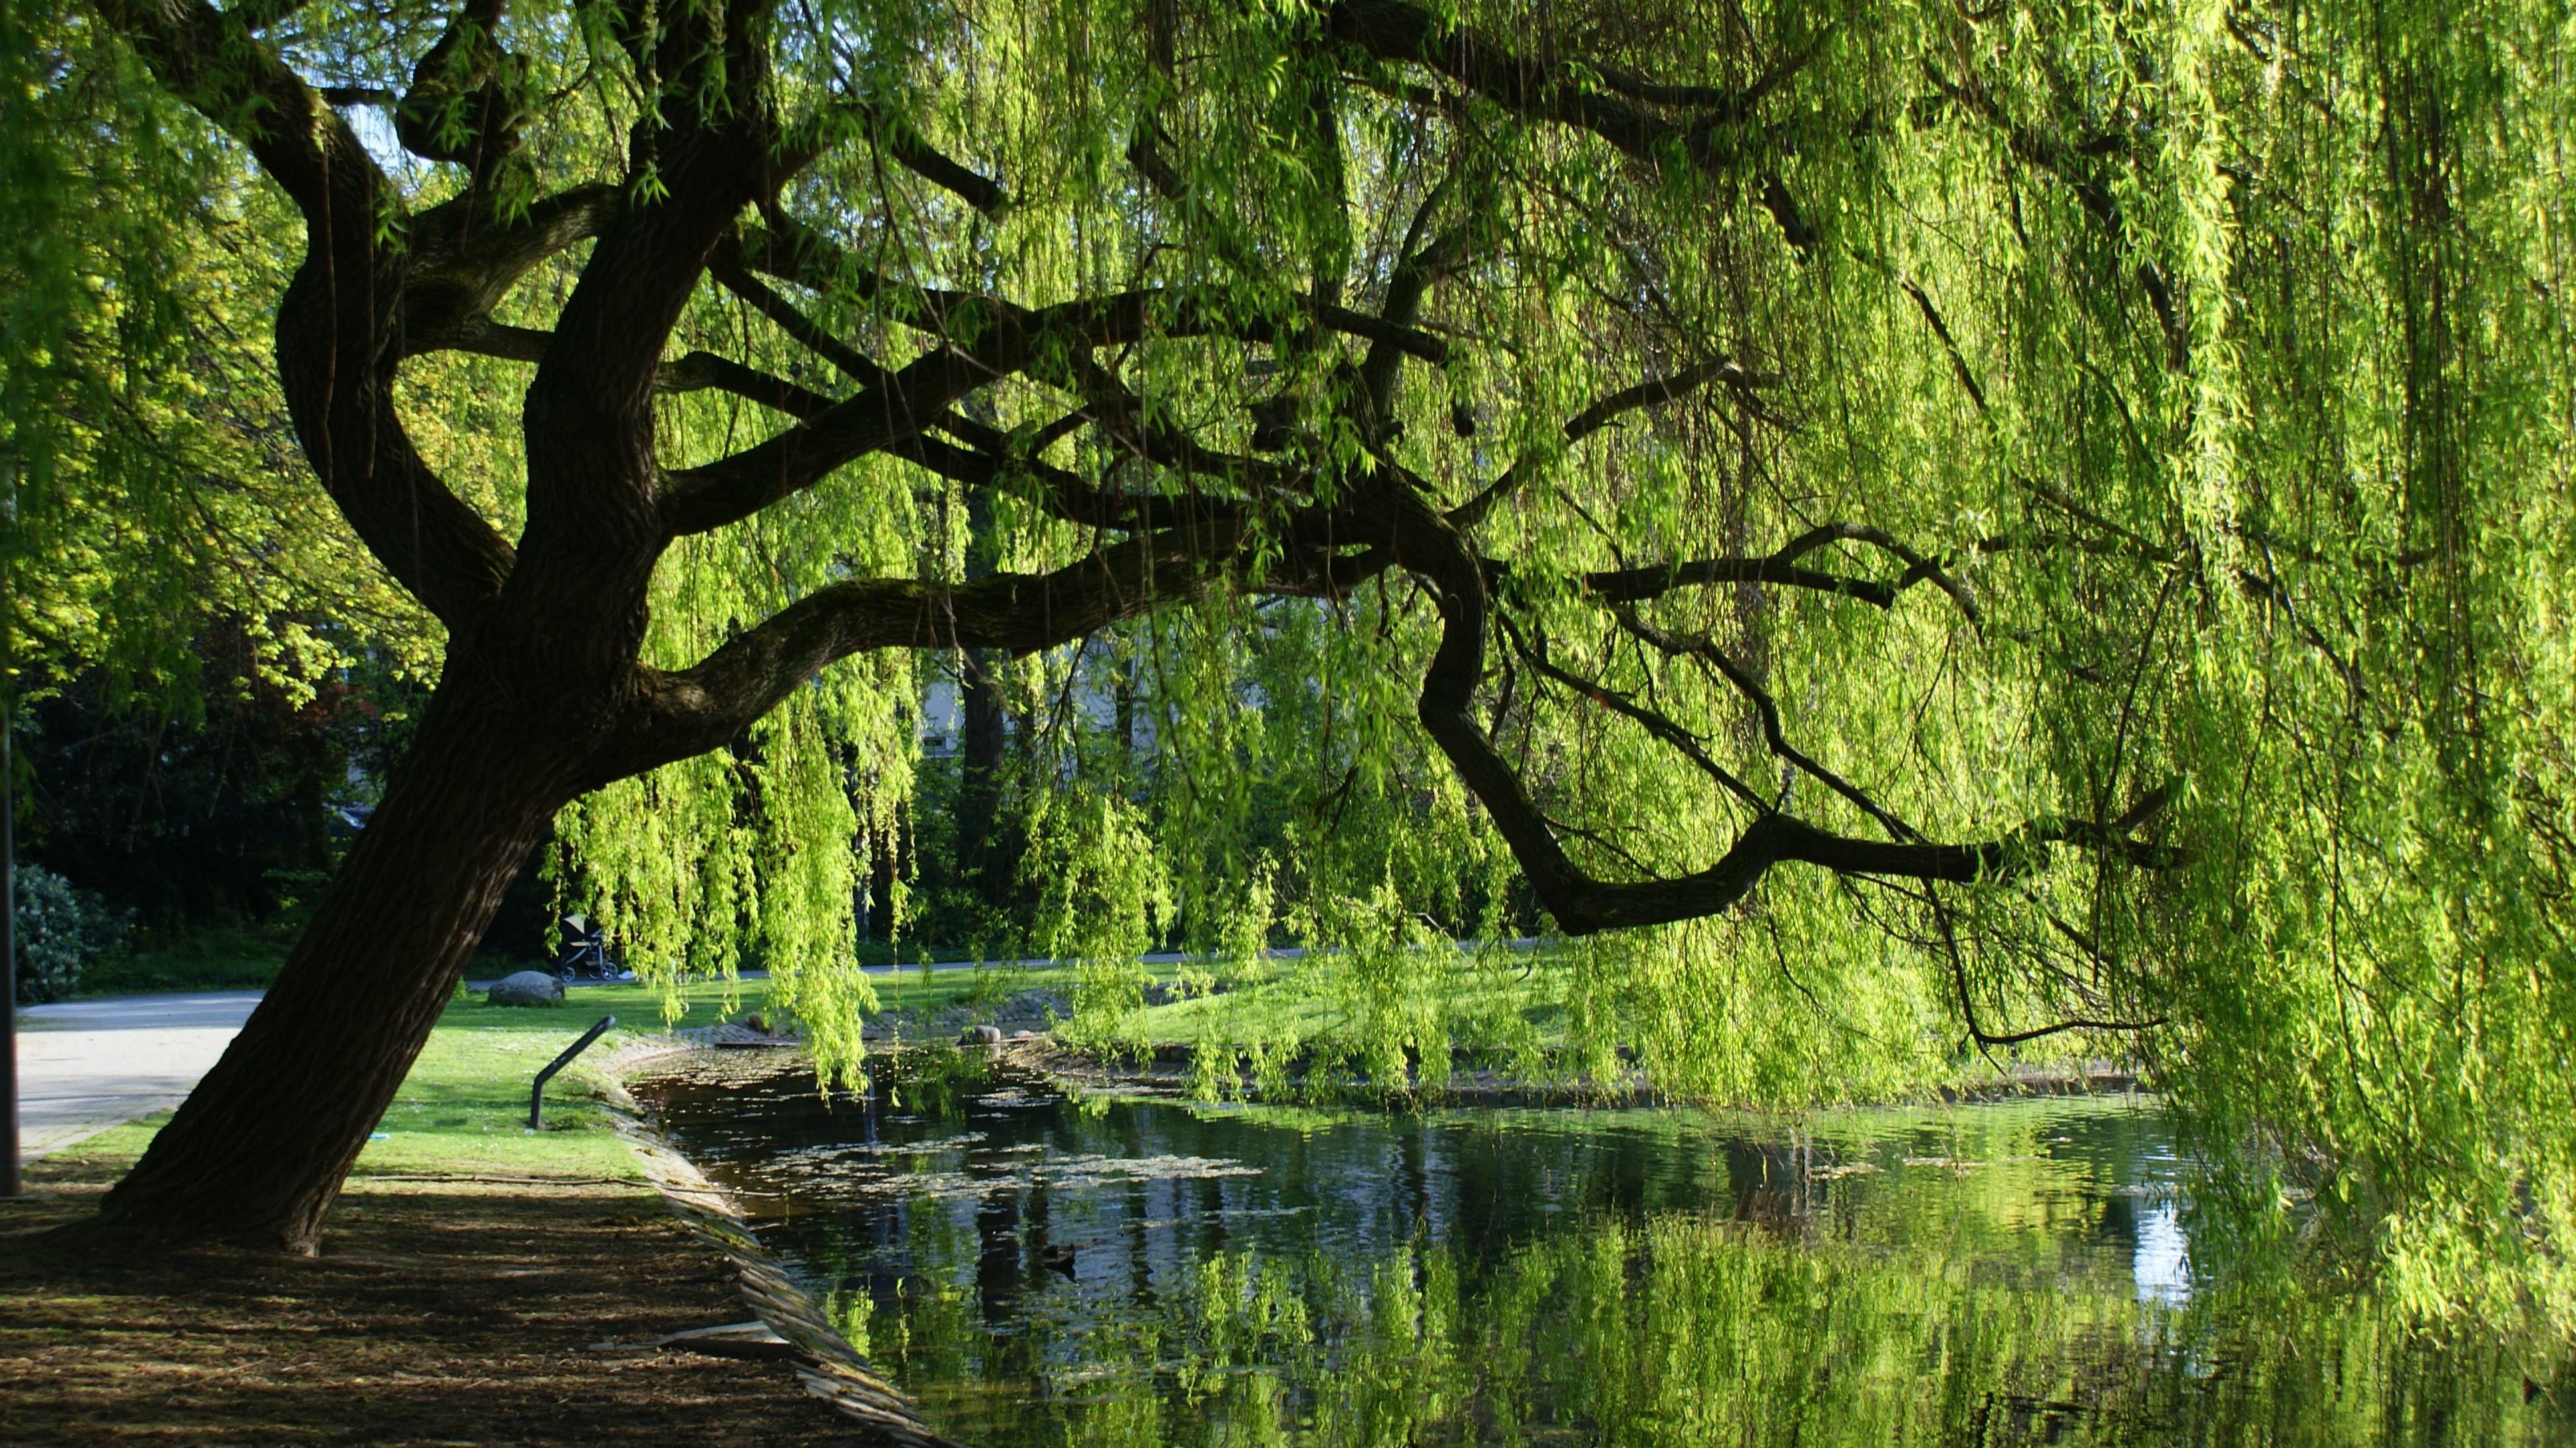 городе ива у озера картинки жизни артистки